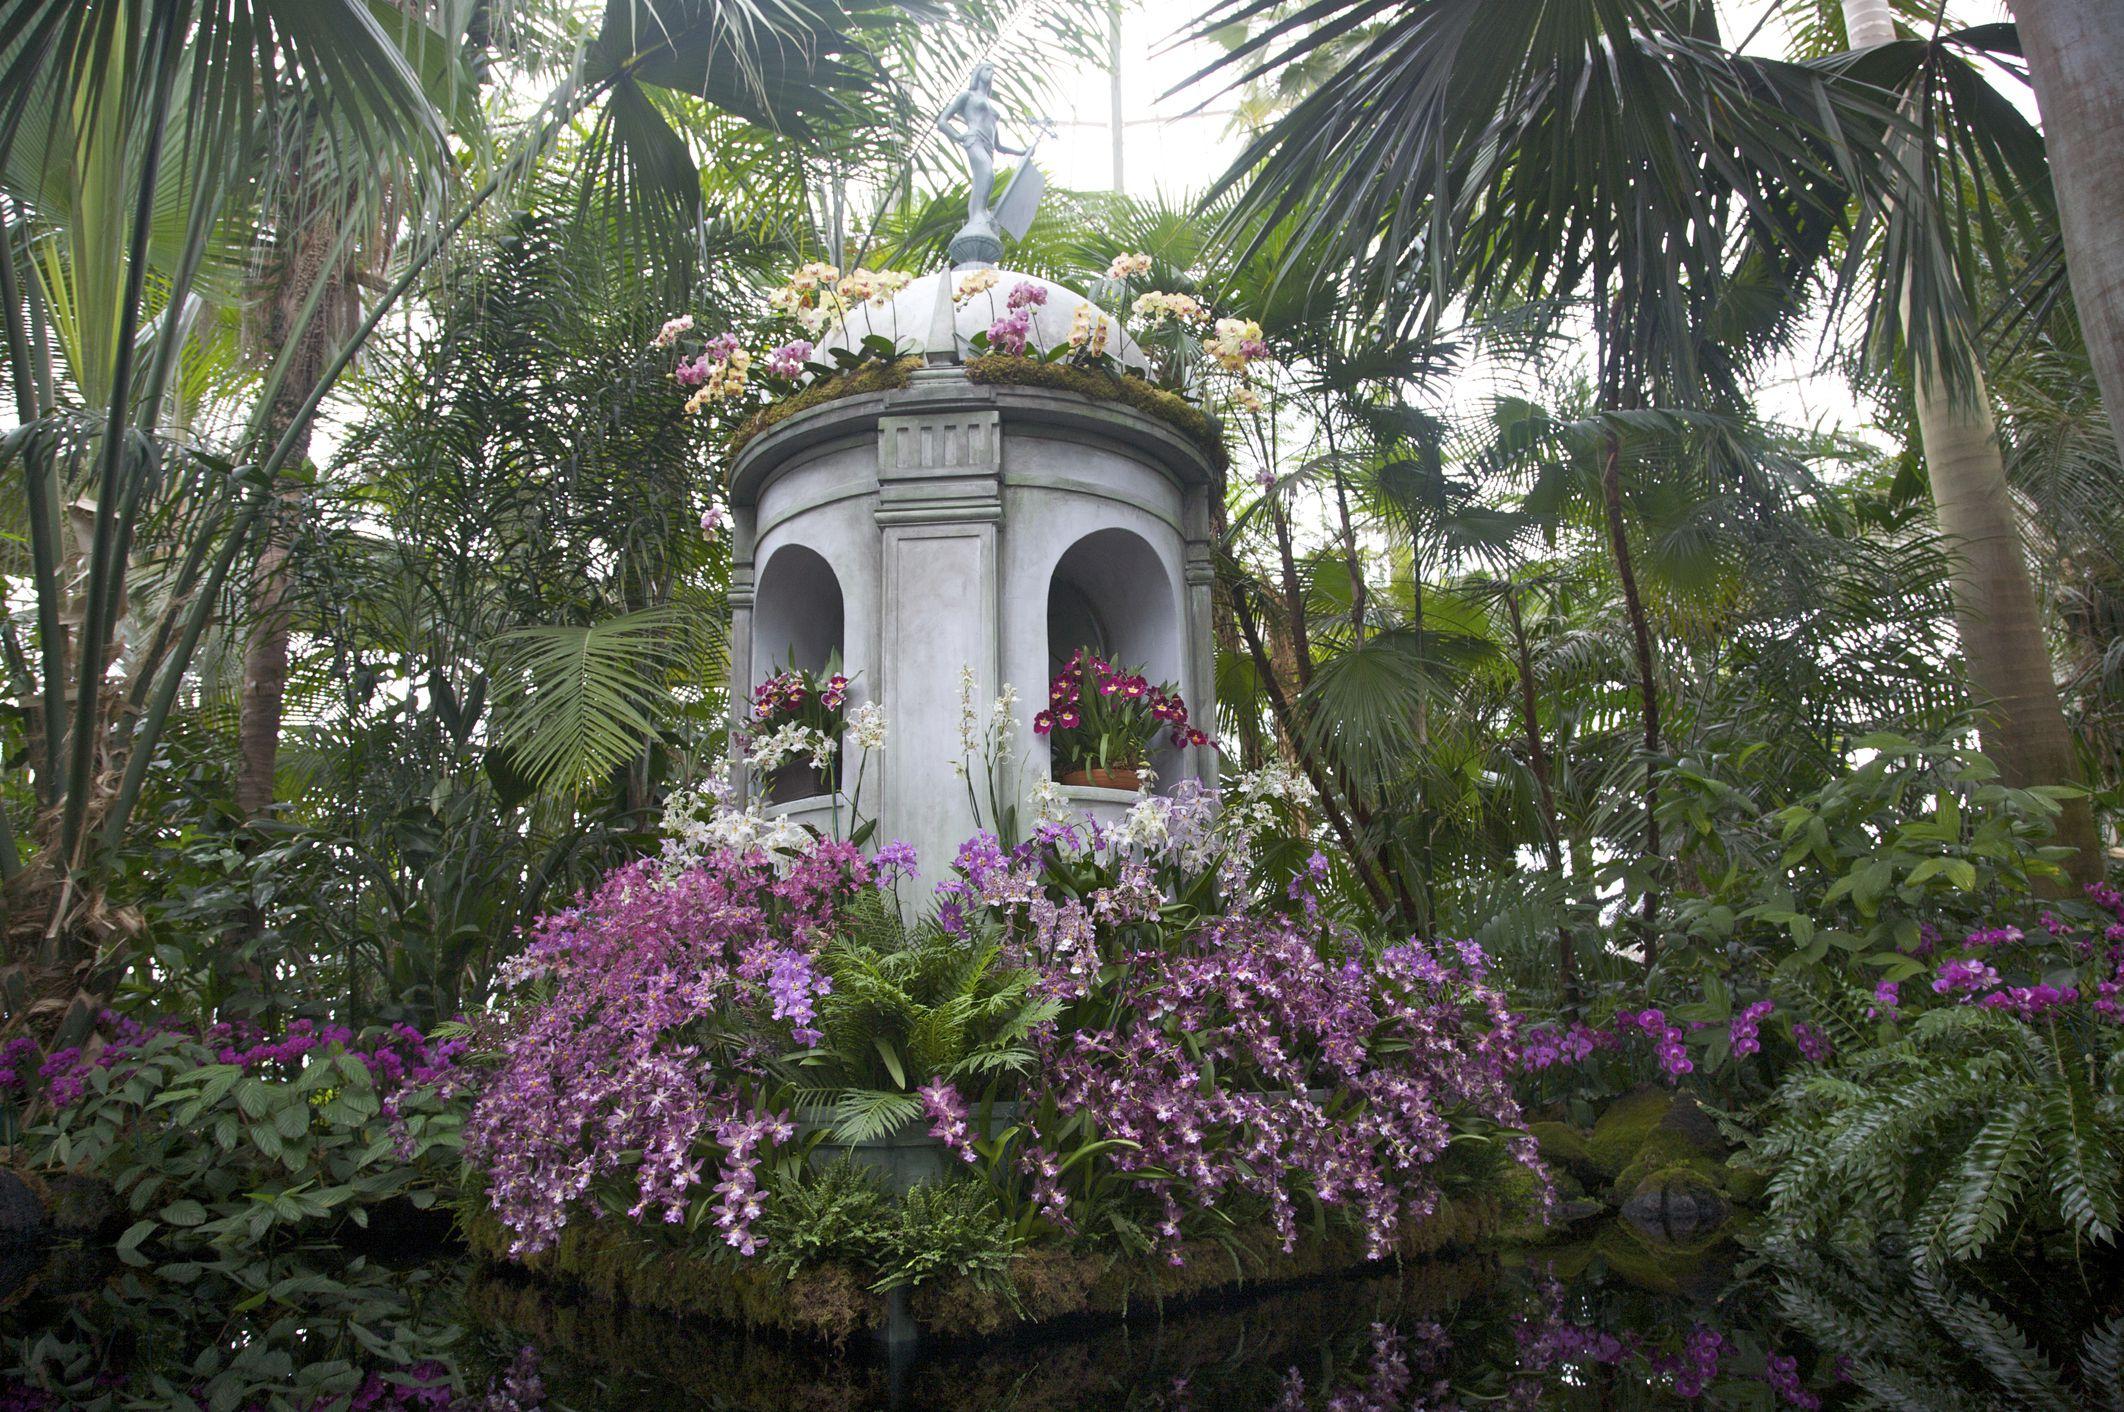 Enid Haupt Conservatory, The New York Botanical Gardens, The Bronx, New York, USA